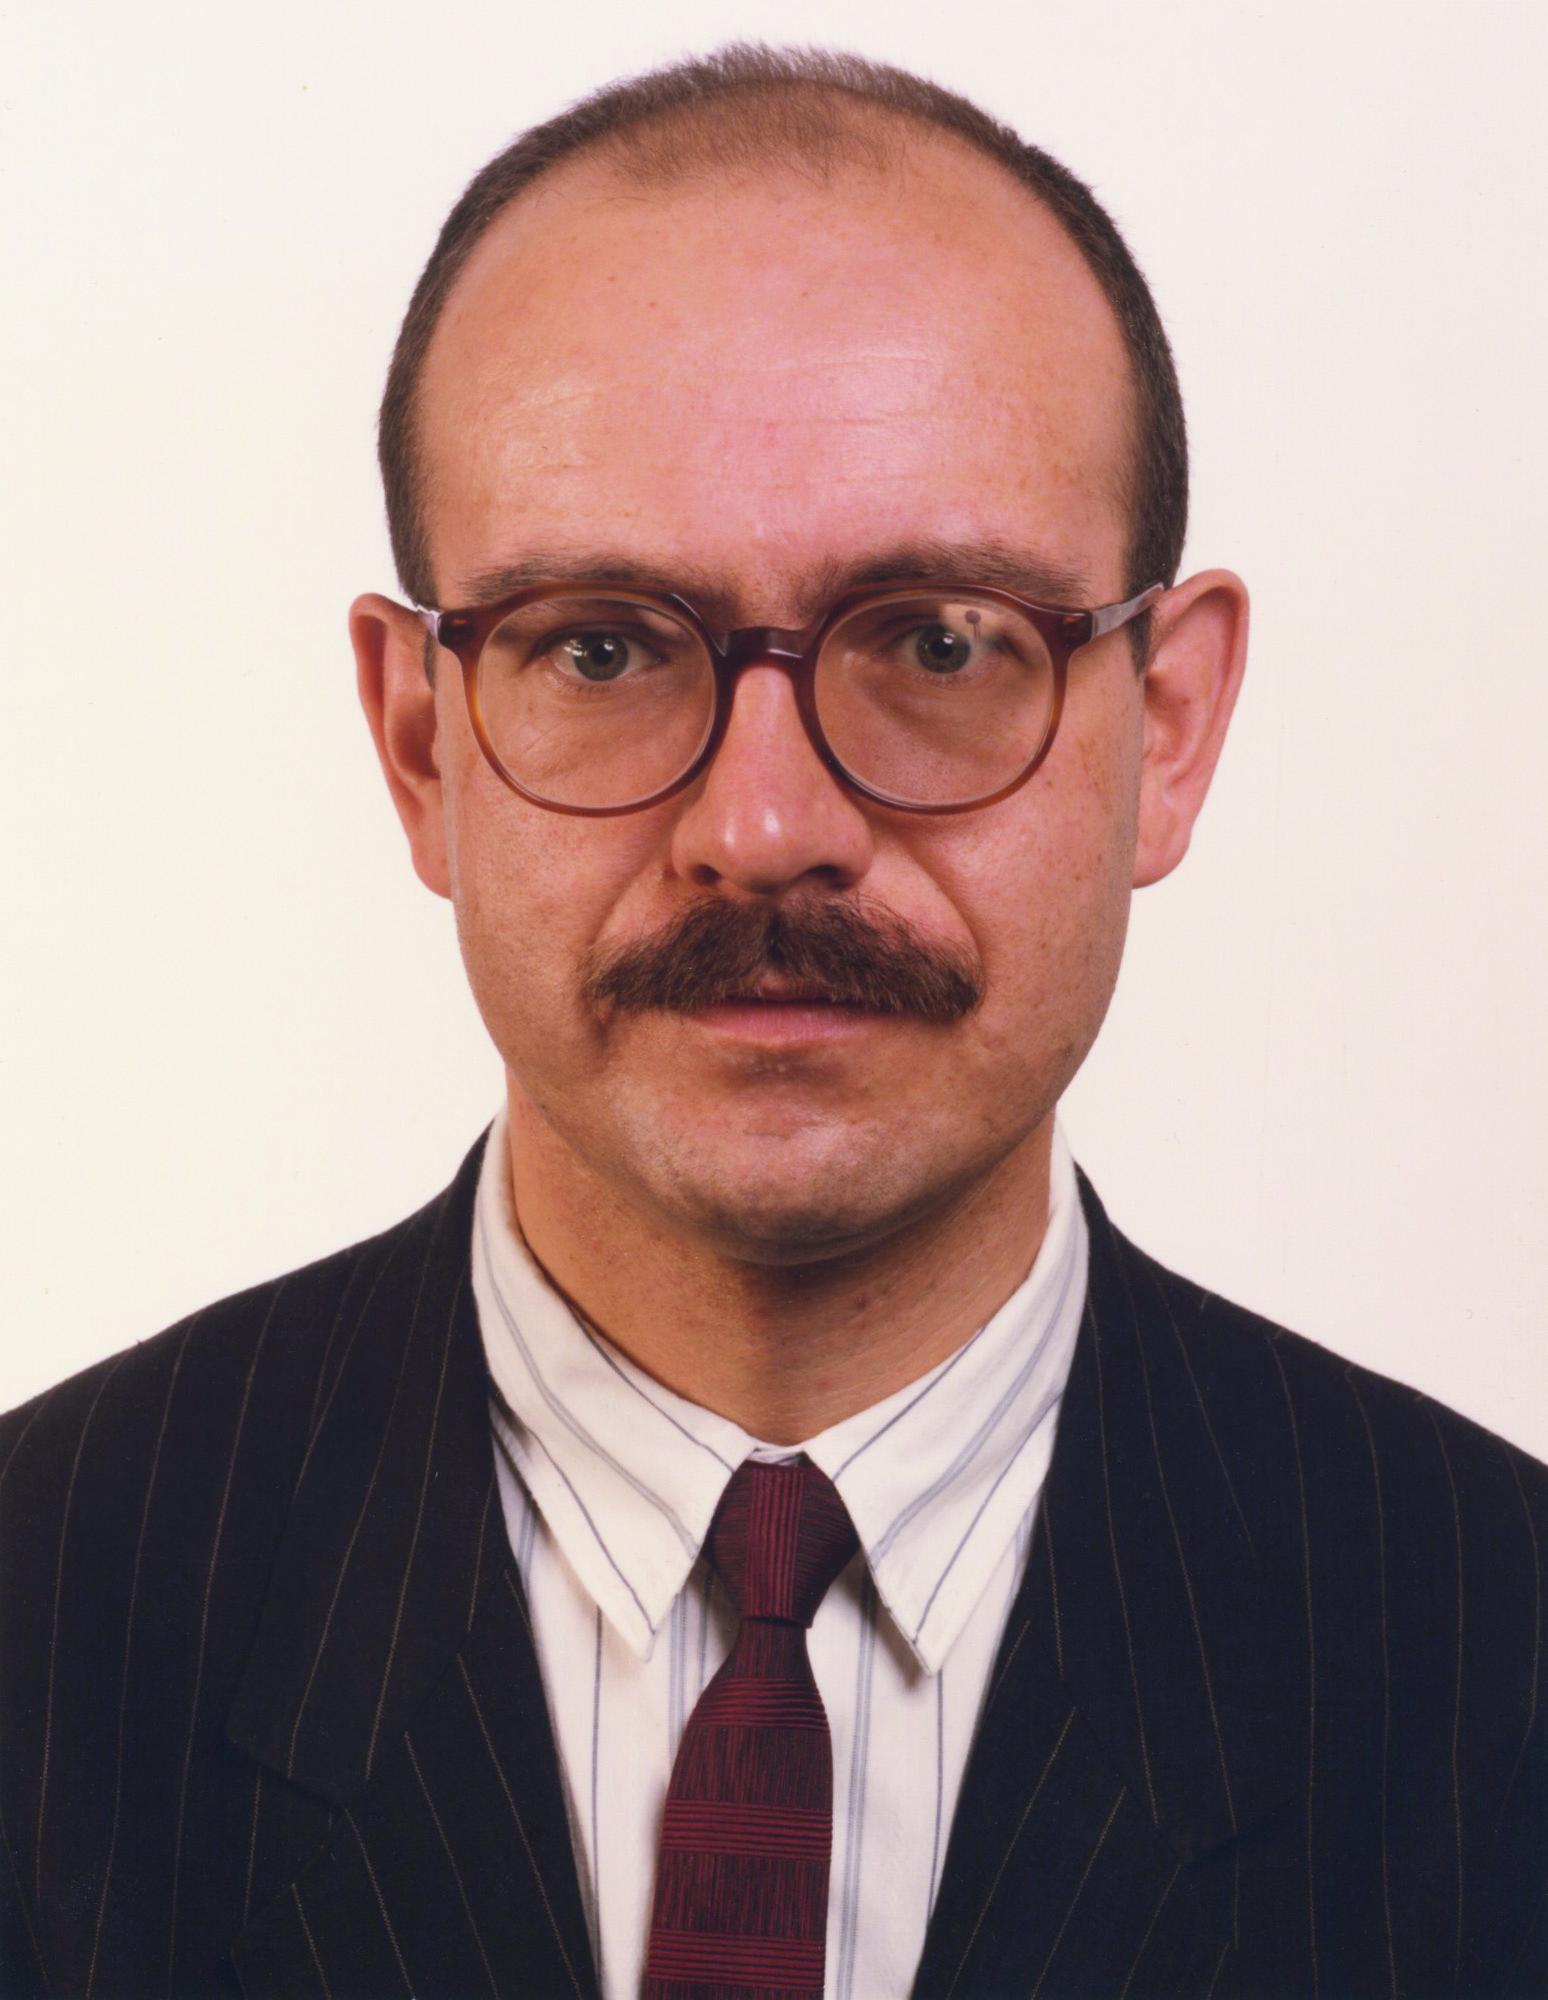 "Thomas Ruff, ''Portrait (Jörg Johnen)"", 1989 © Thomas Ruff und VG Bild-Kunst, Bonn 2021"